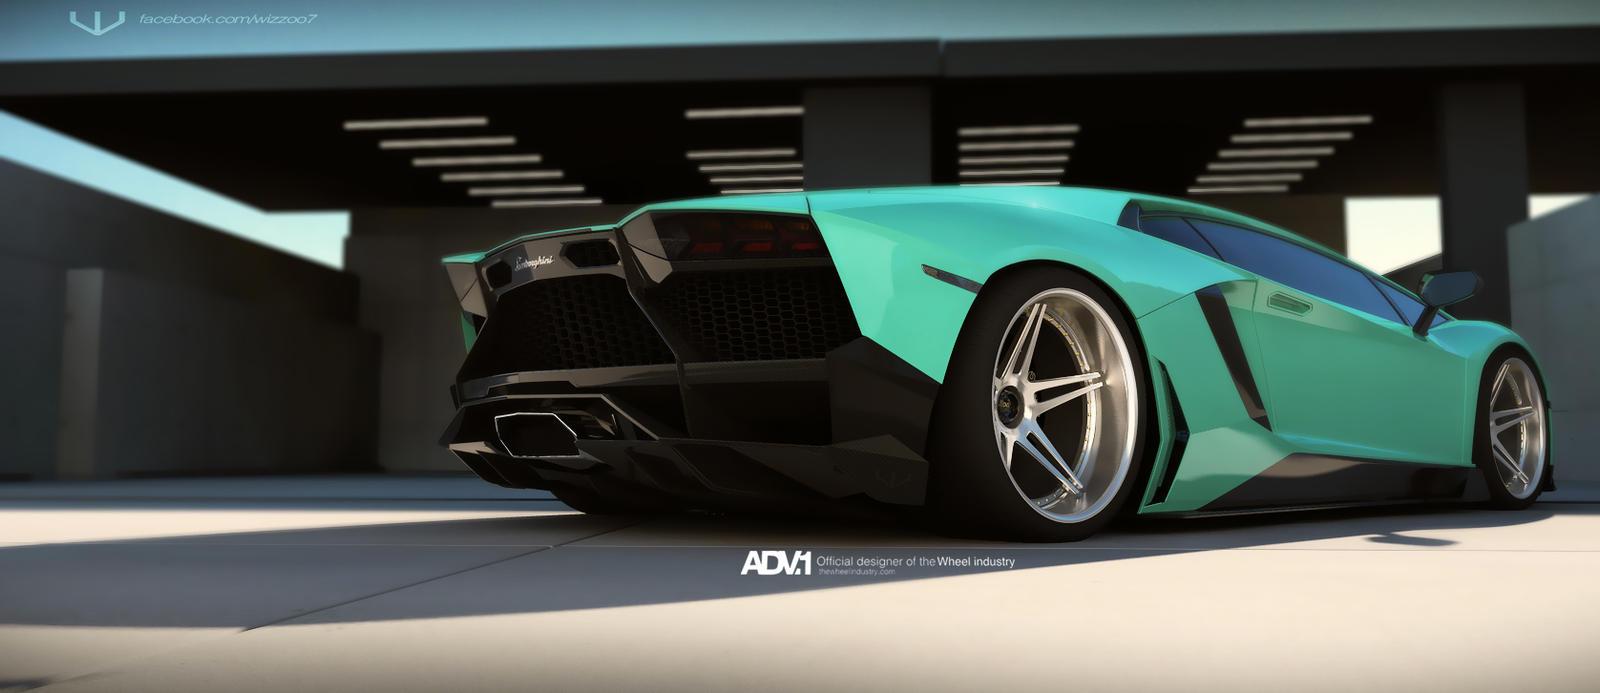 Lamborghini Aventador Spyder >> Aventador ADV.1 05 by wizzoo7 on DeviantArt